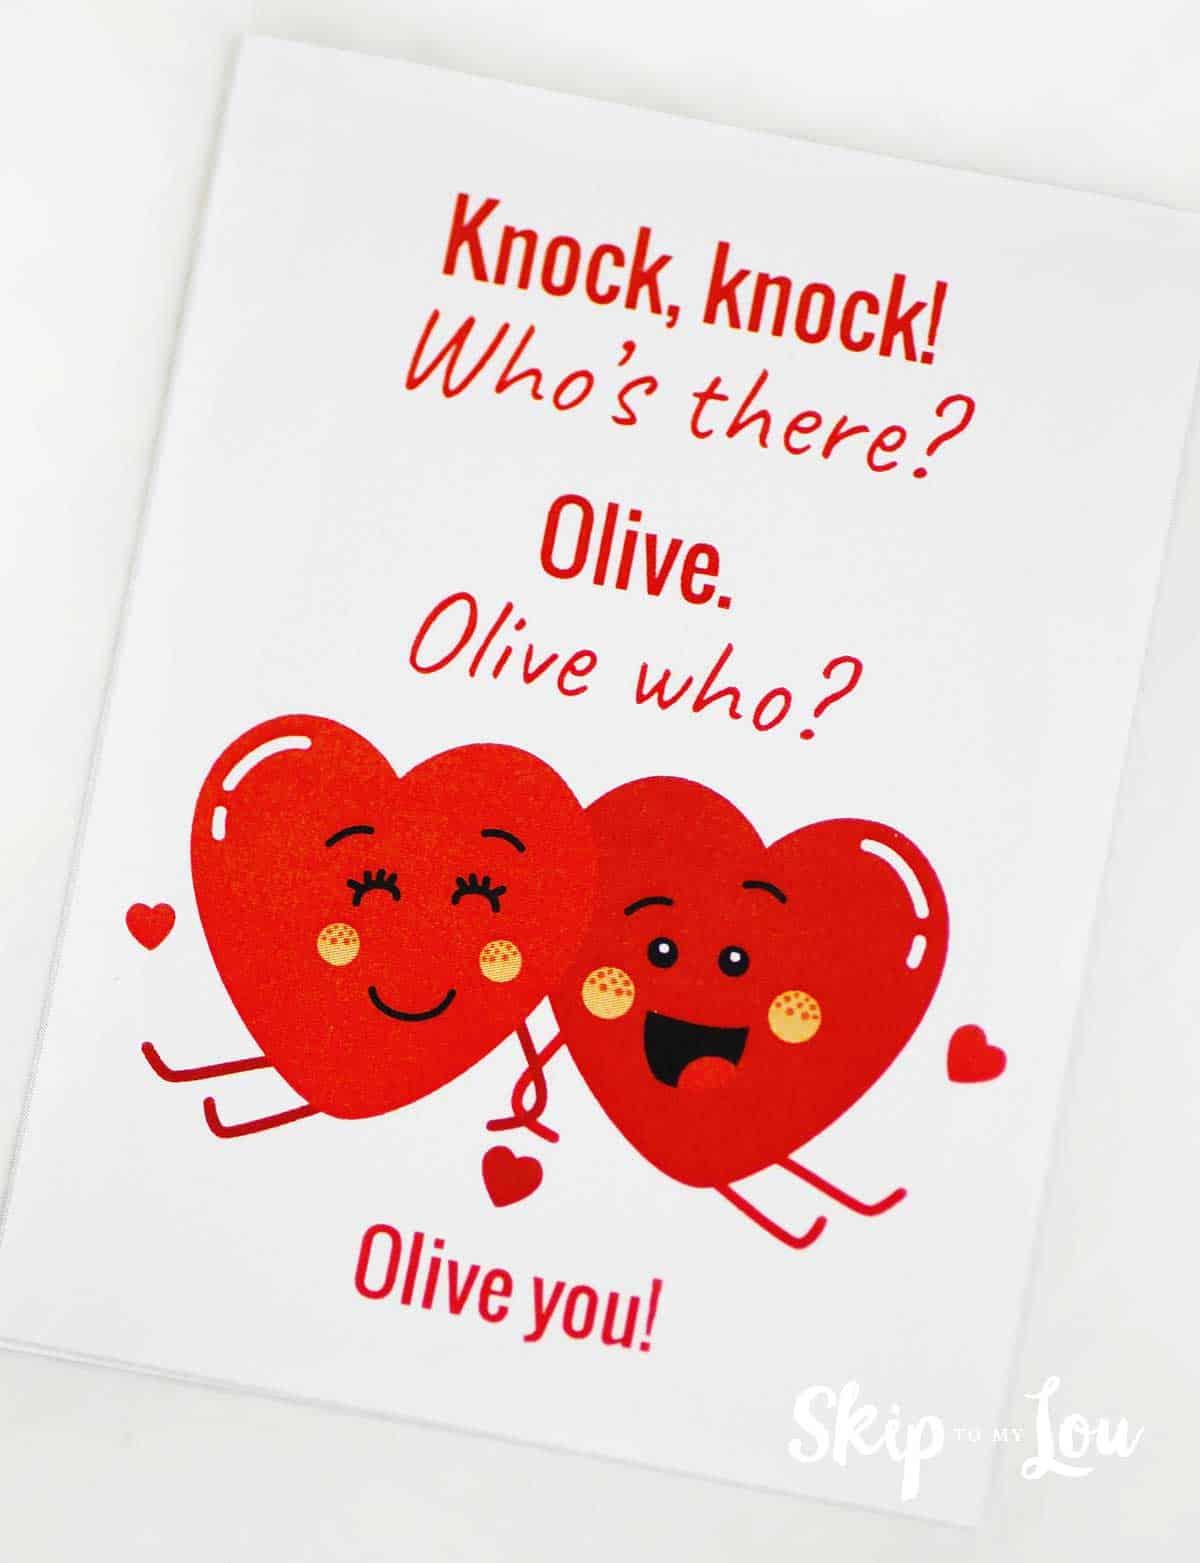 Olive you knock knock joke printable card